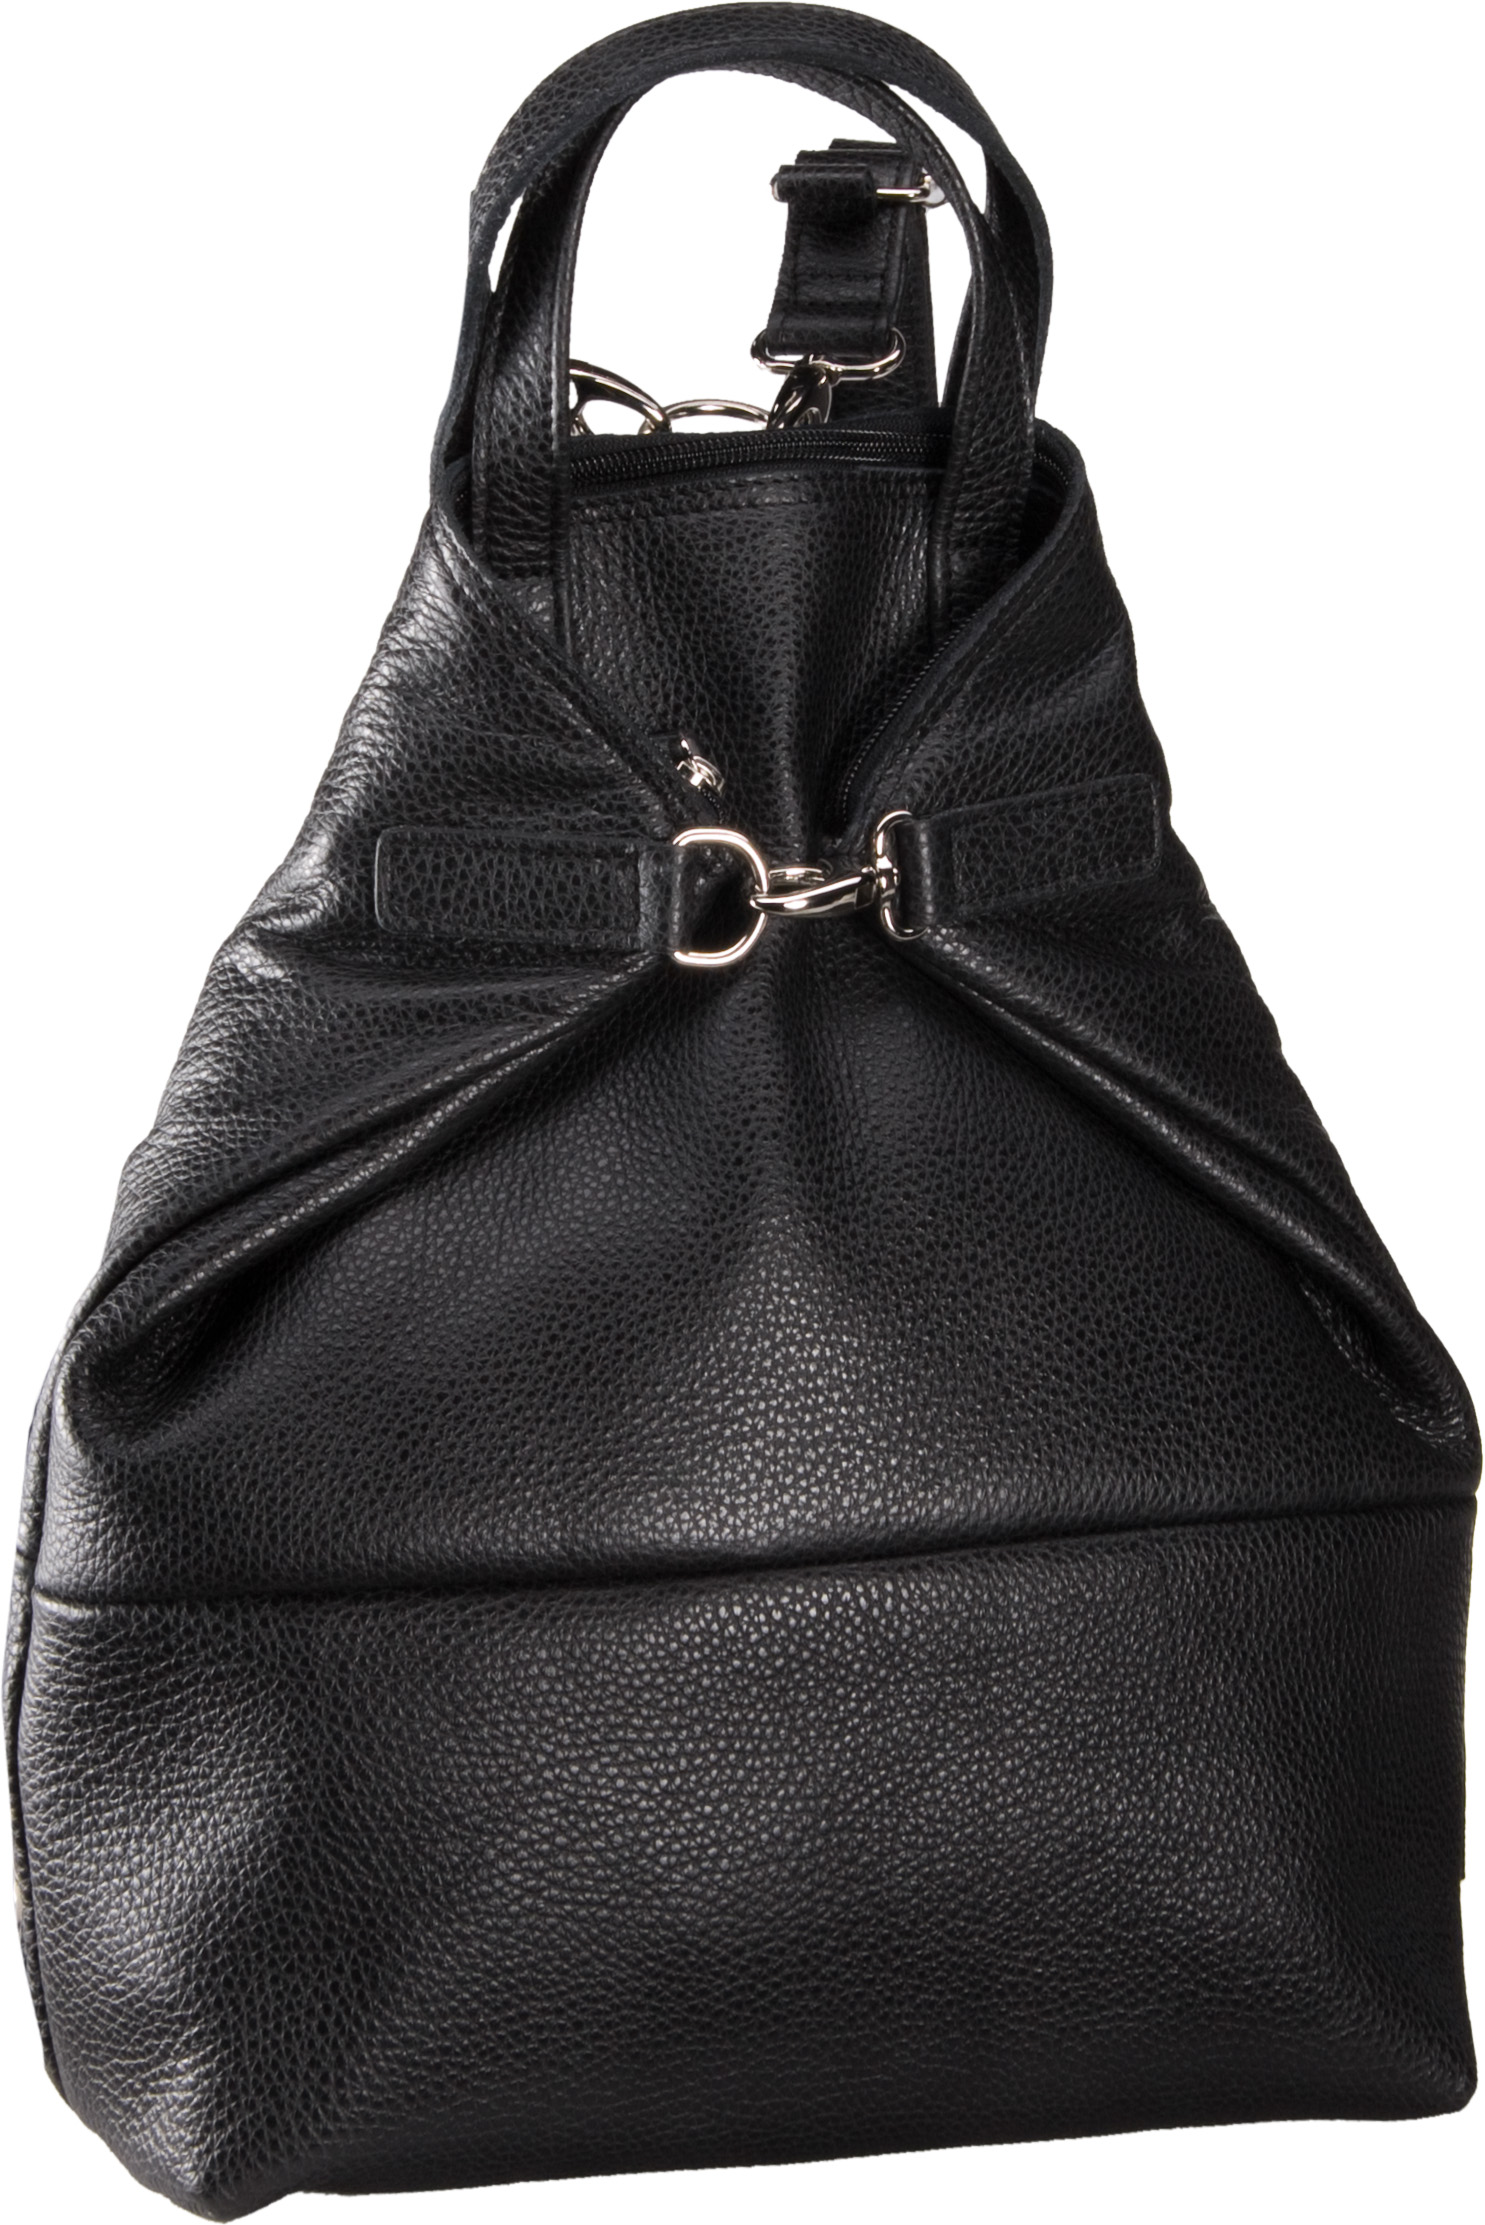 Rucksack / Daypack Vika 1910 X-Change 3in1 Bag S Schwarz